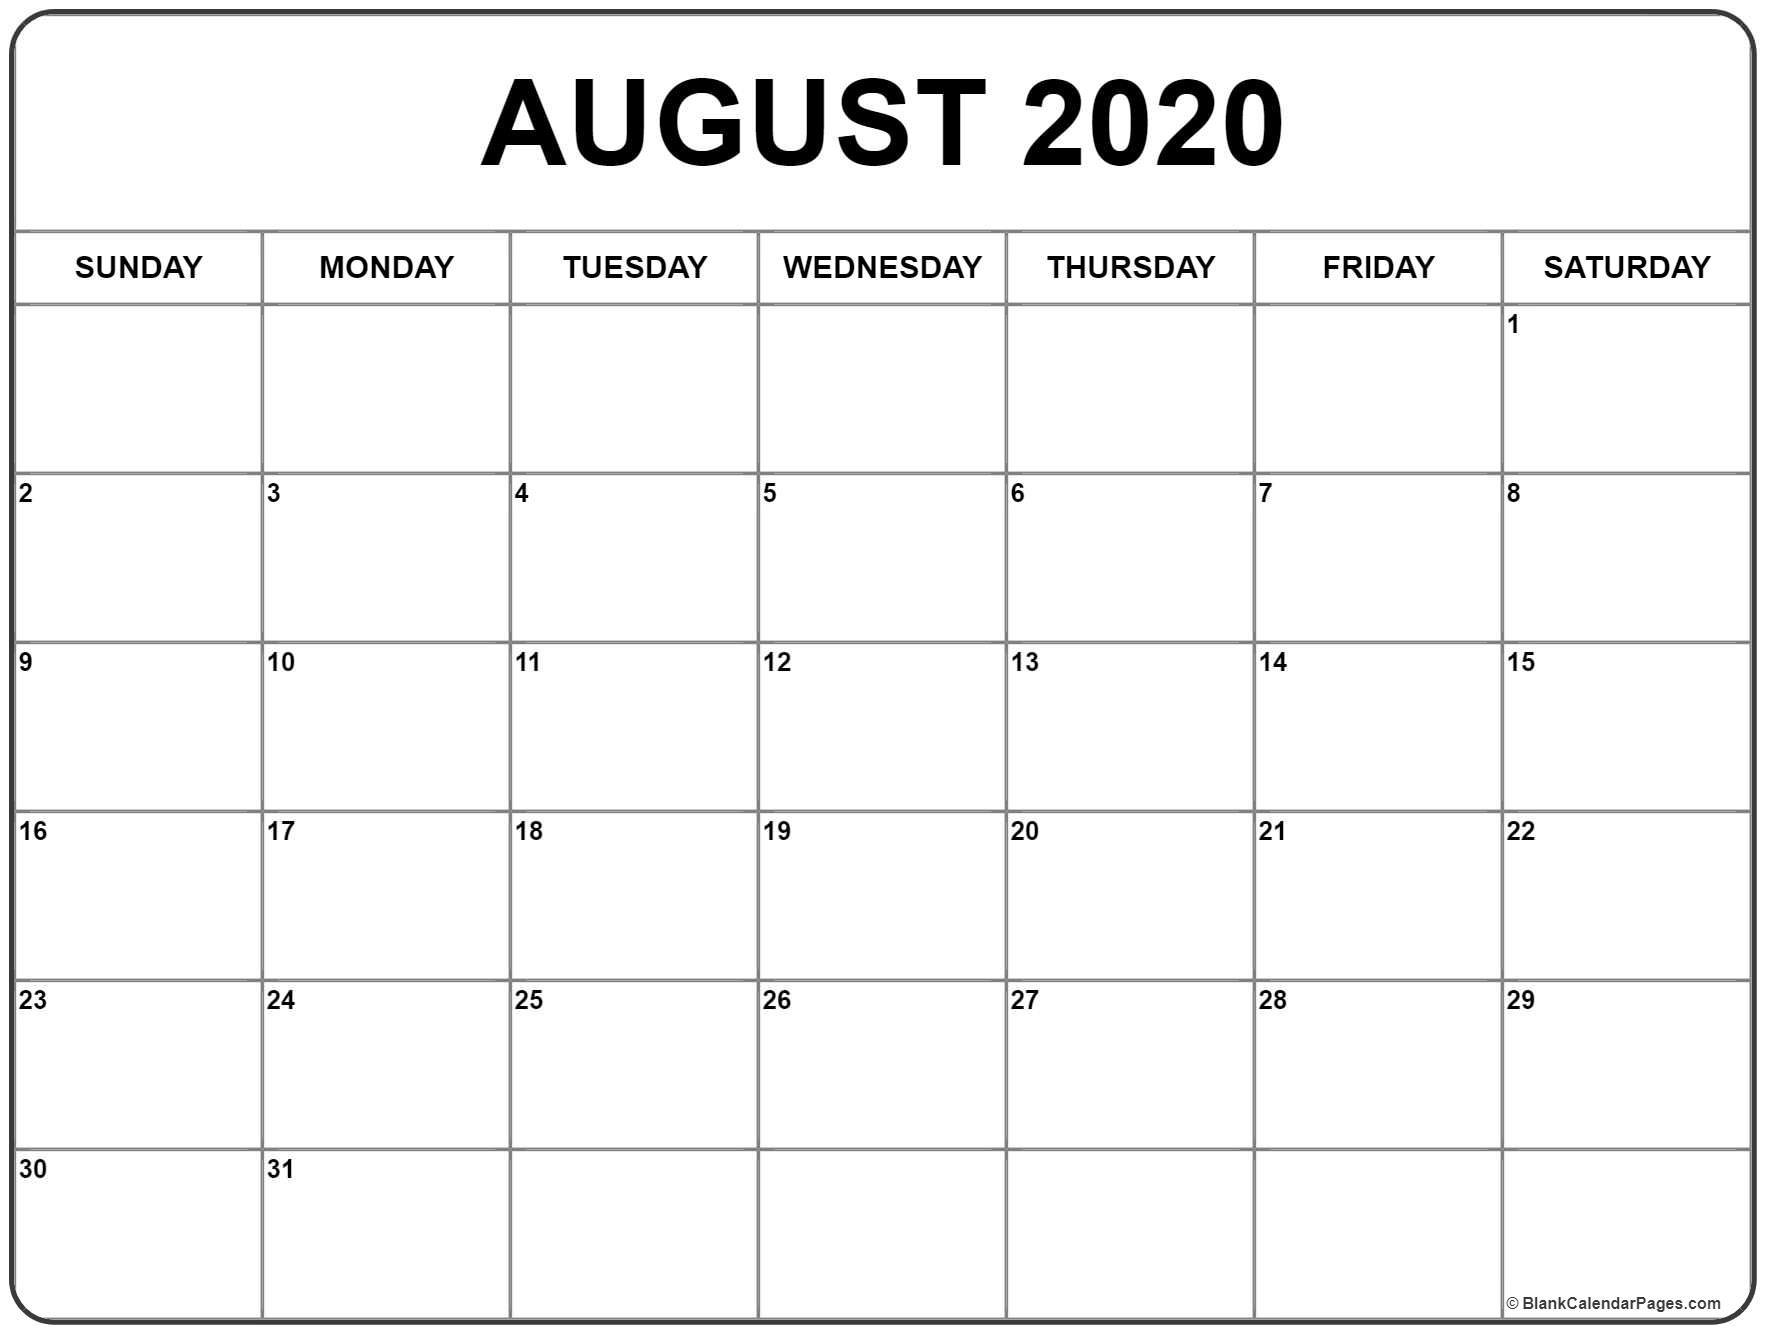 August Calandar - Parfu.kaptanband.co-Luxe Calendar Aug 2020 Blank Printable